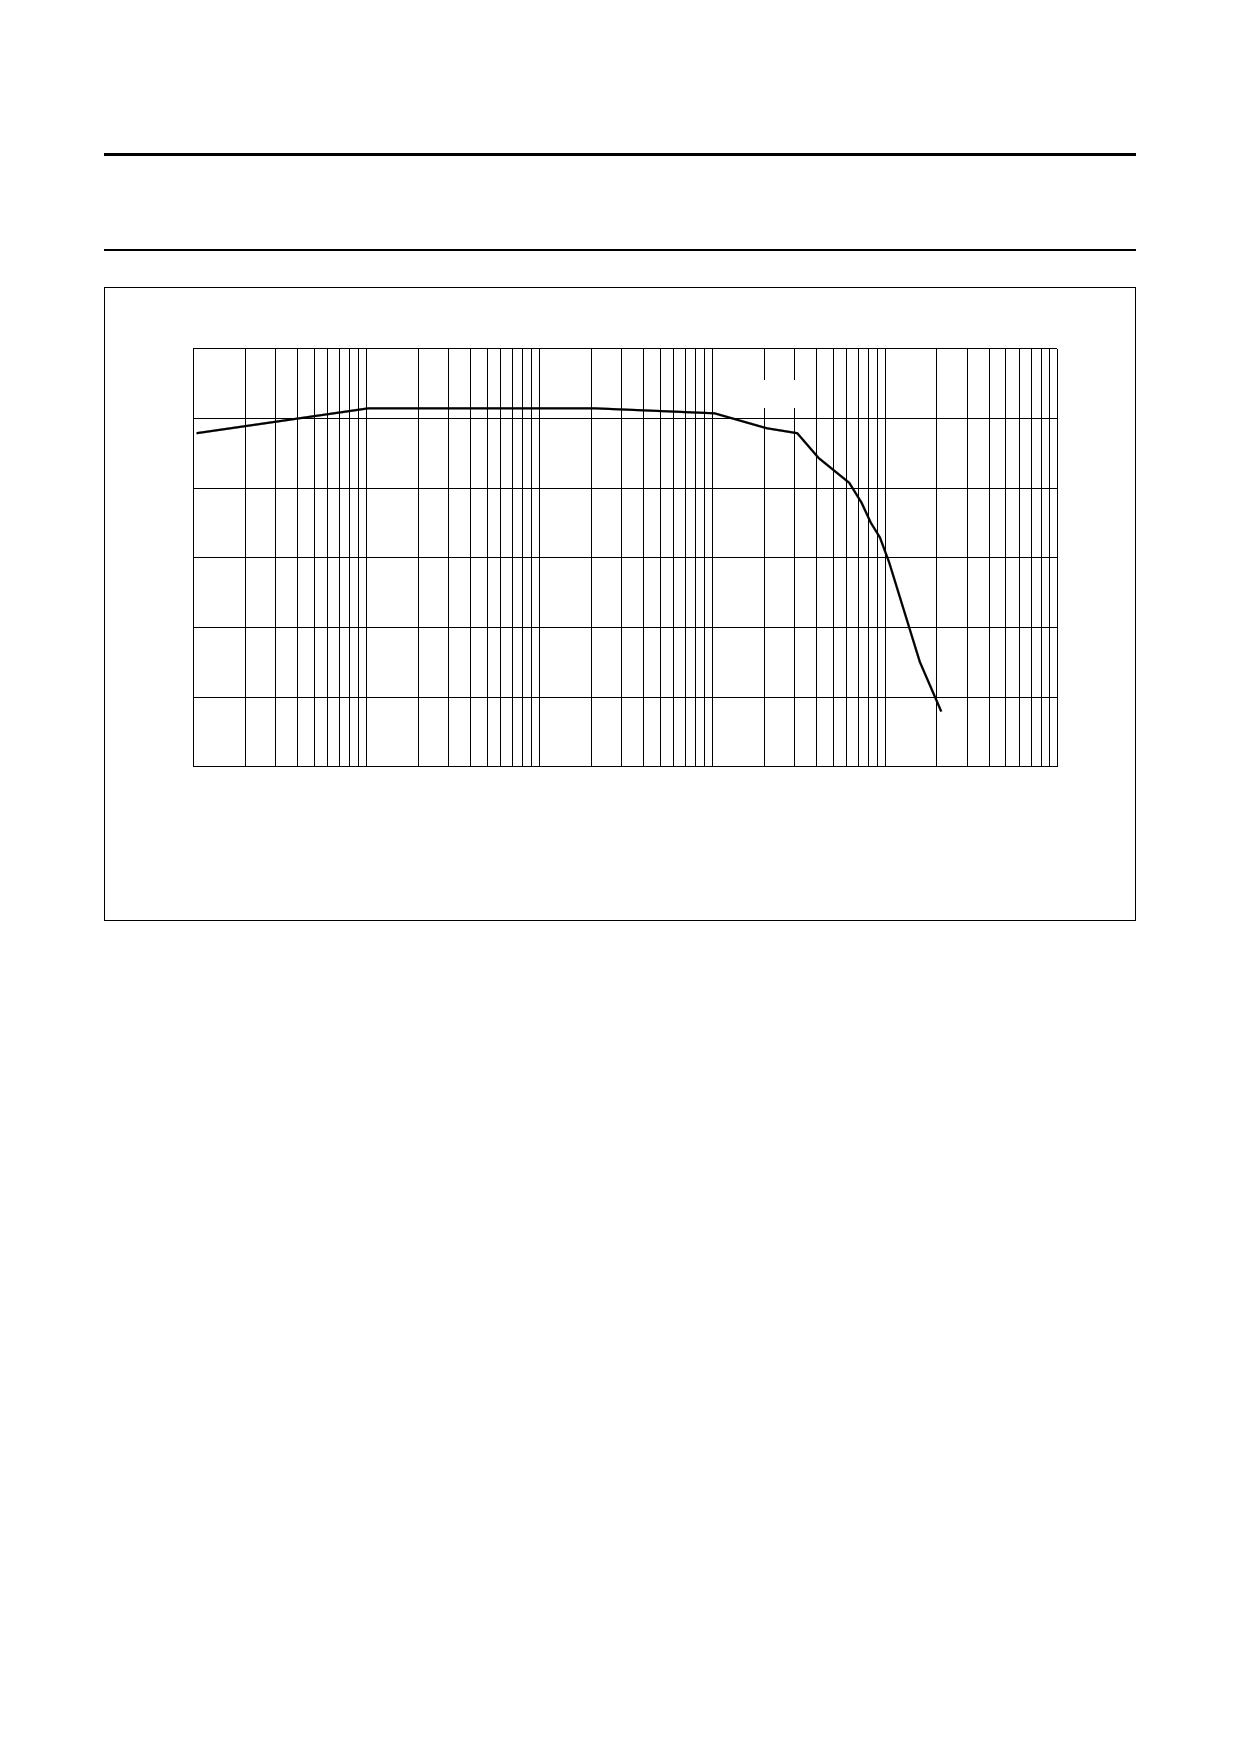 BC550 pdf, 반도체, 판매, 대치품